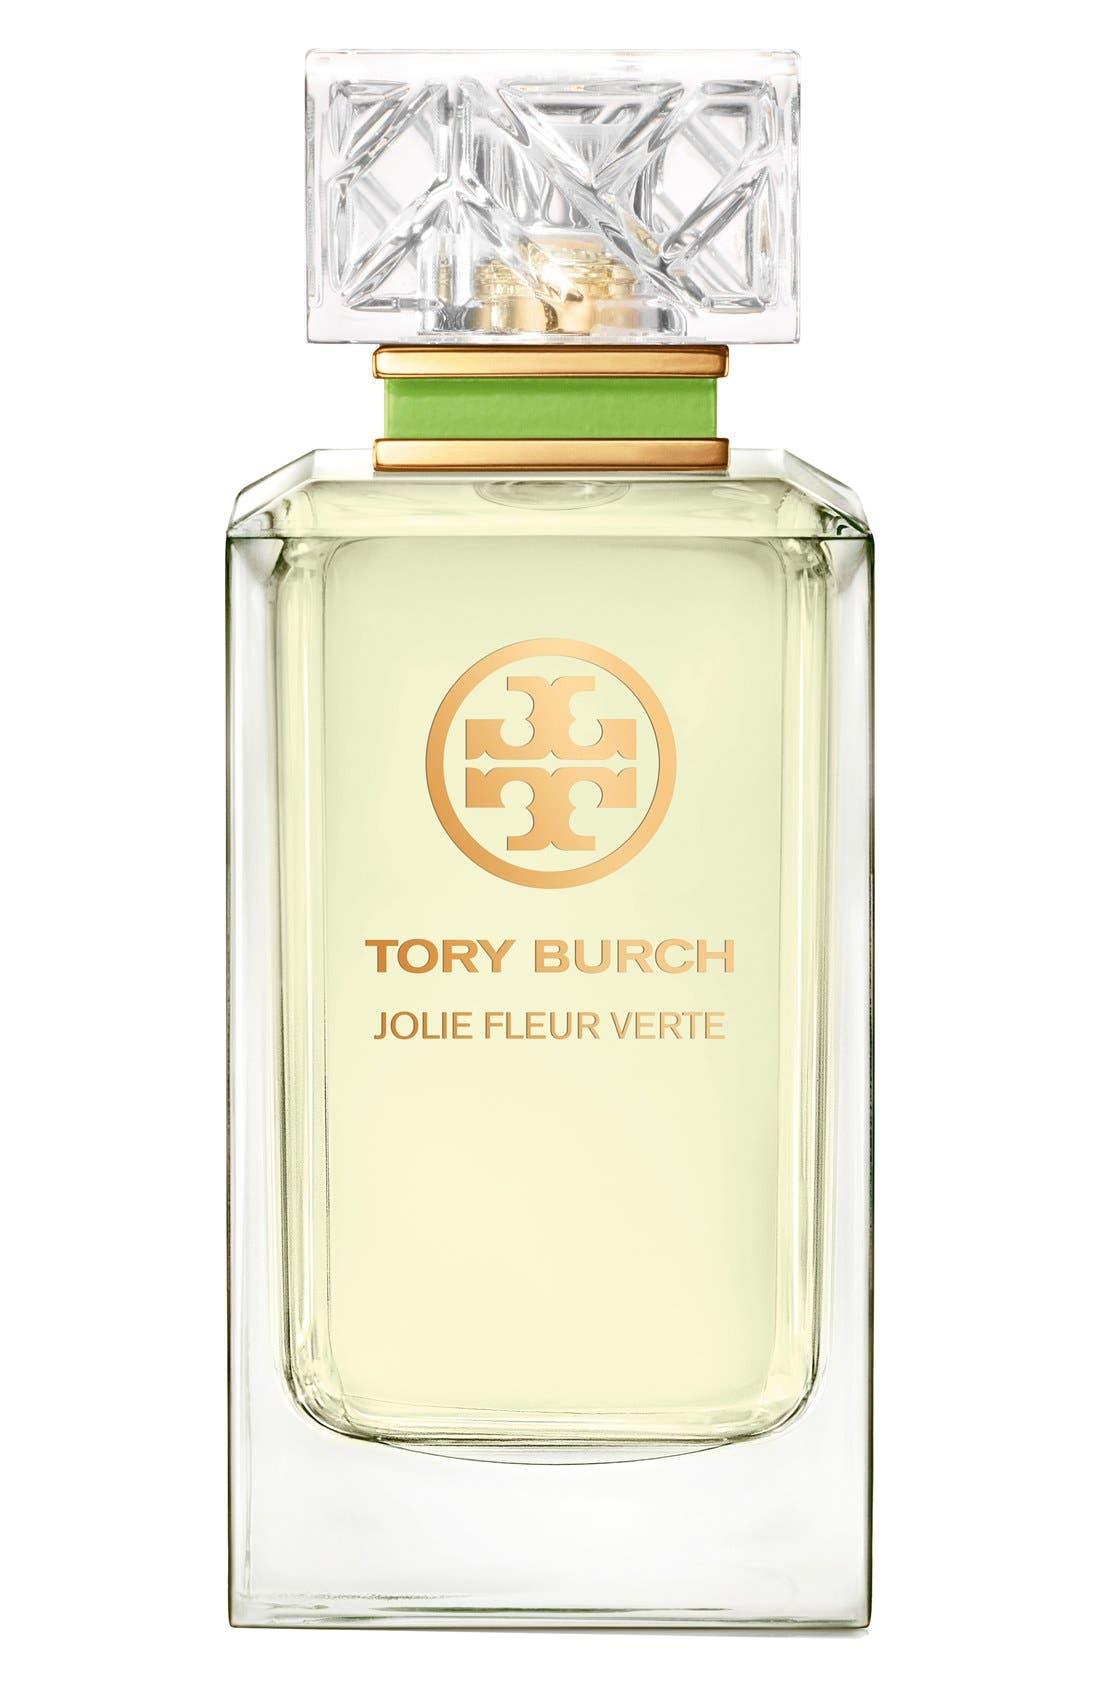 Tory Burch 'Jolie Fleur - Verte' Eau de Parfum Spray